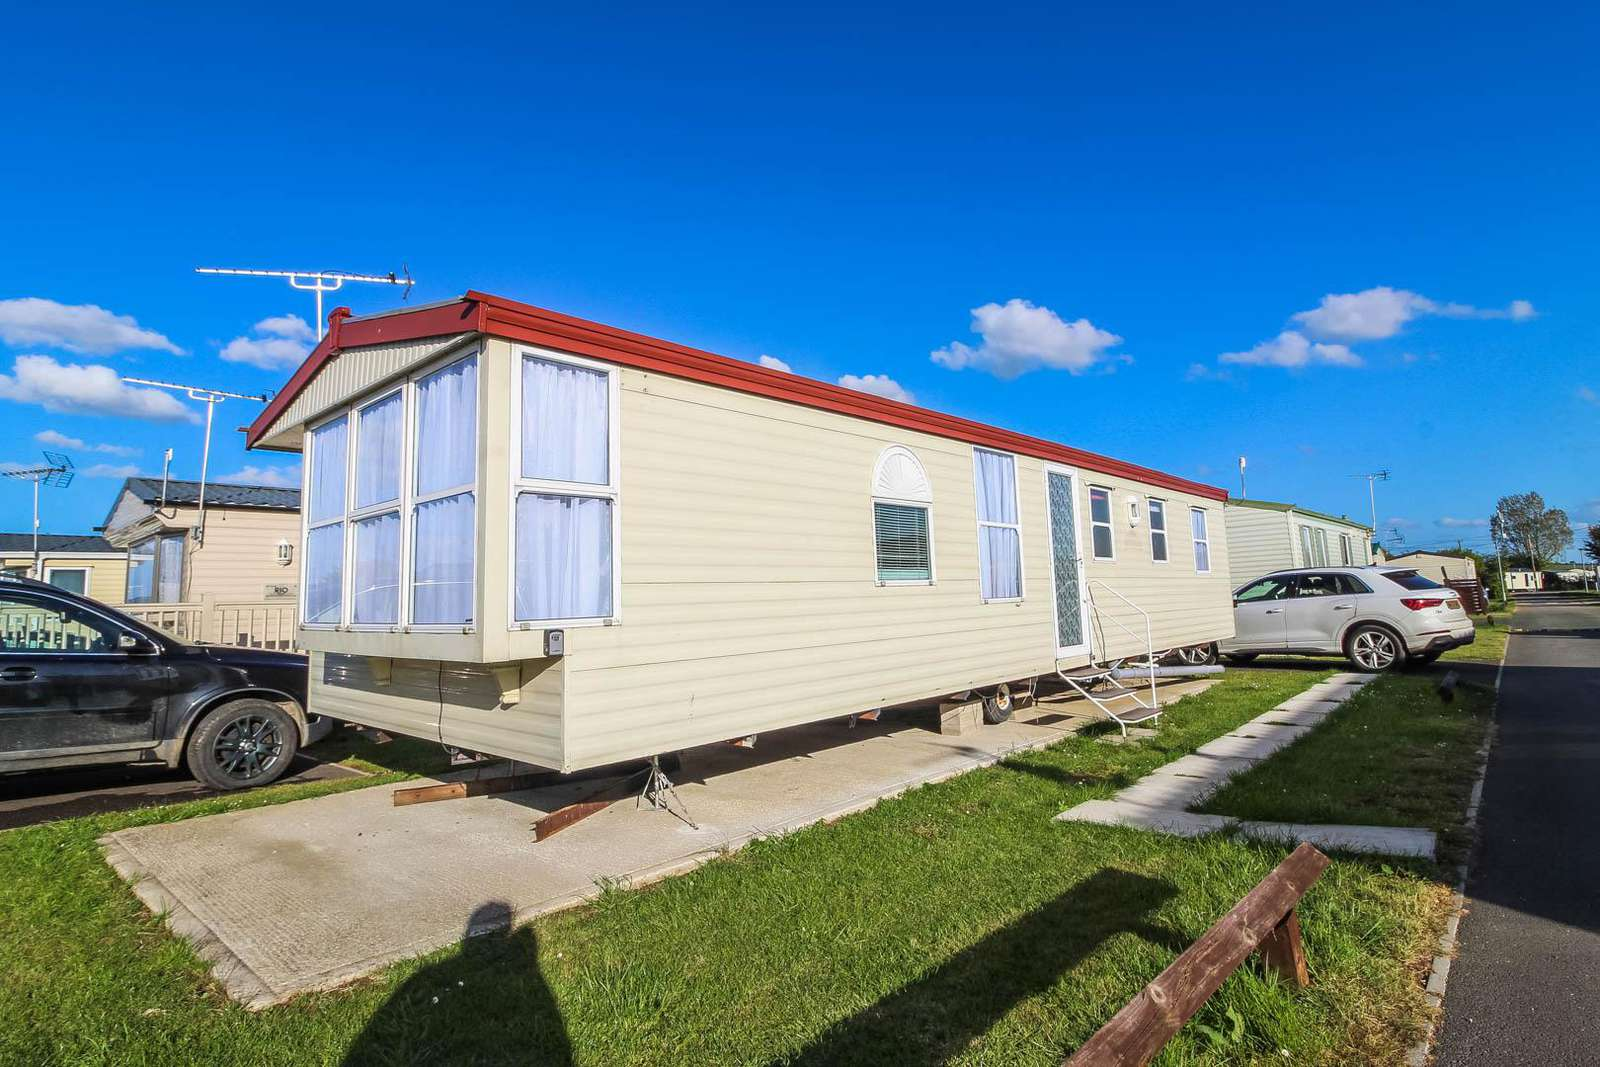 36088FO – FO area, 3 bed, 8 berth caravan. Emerald rated. - property